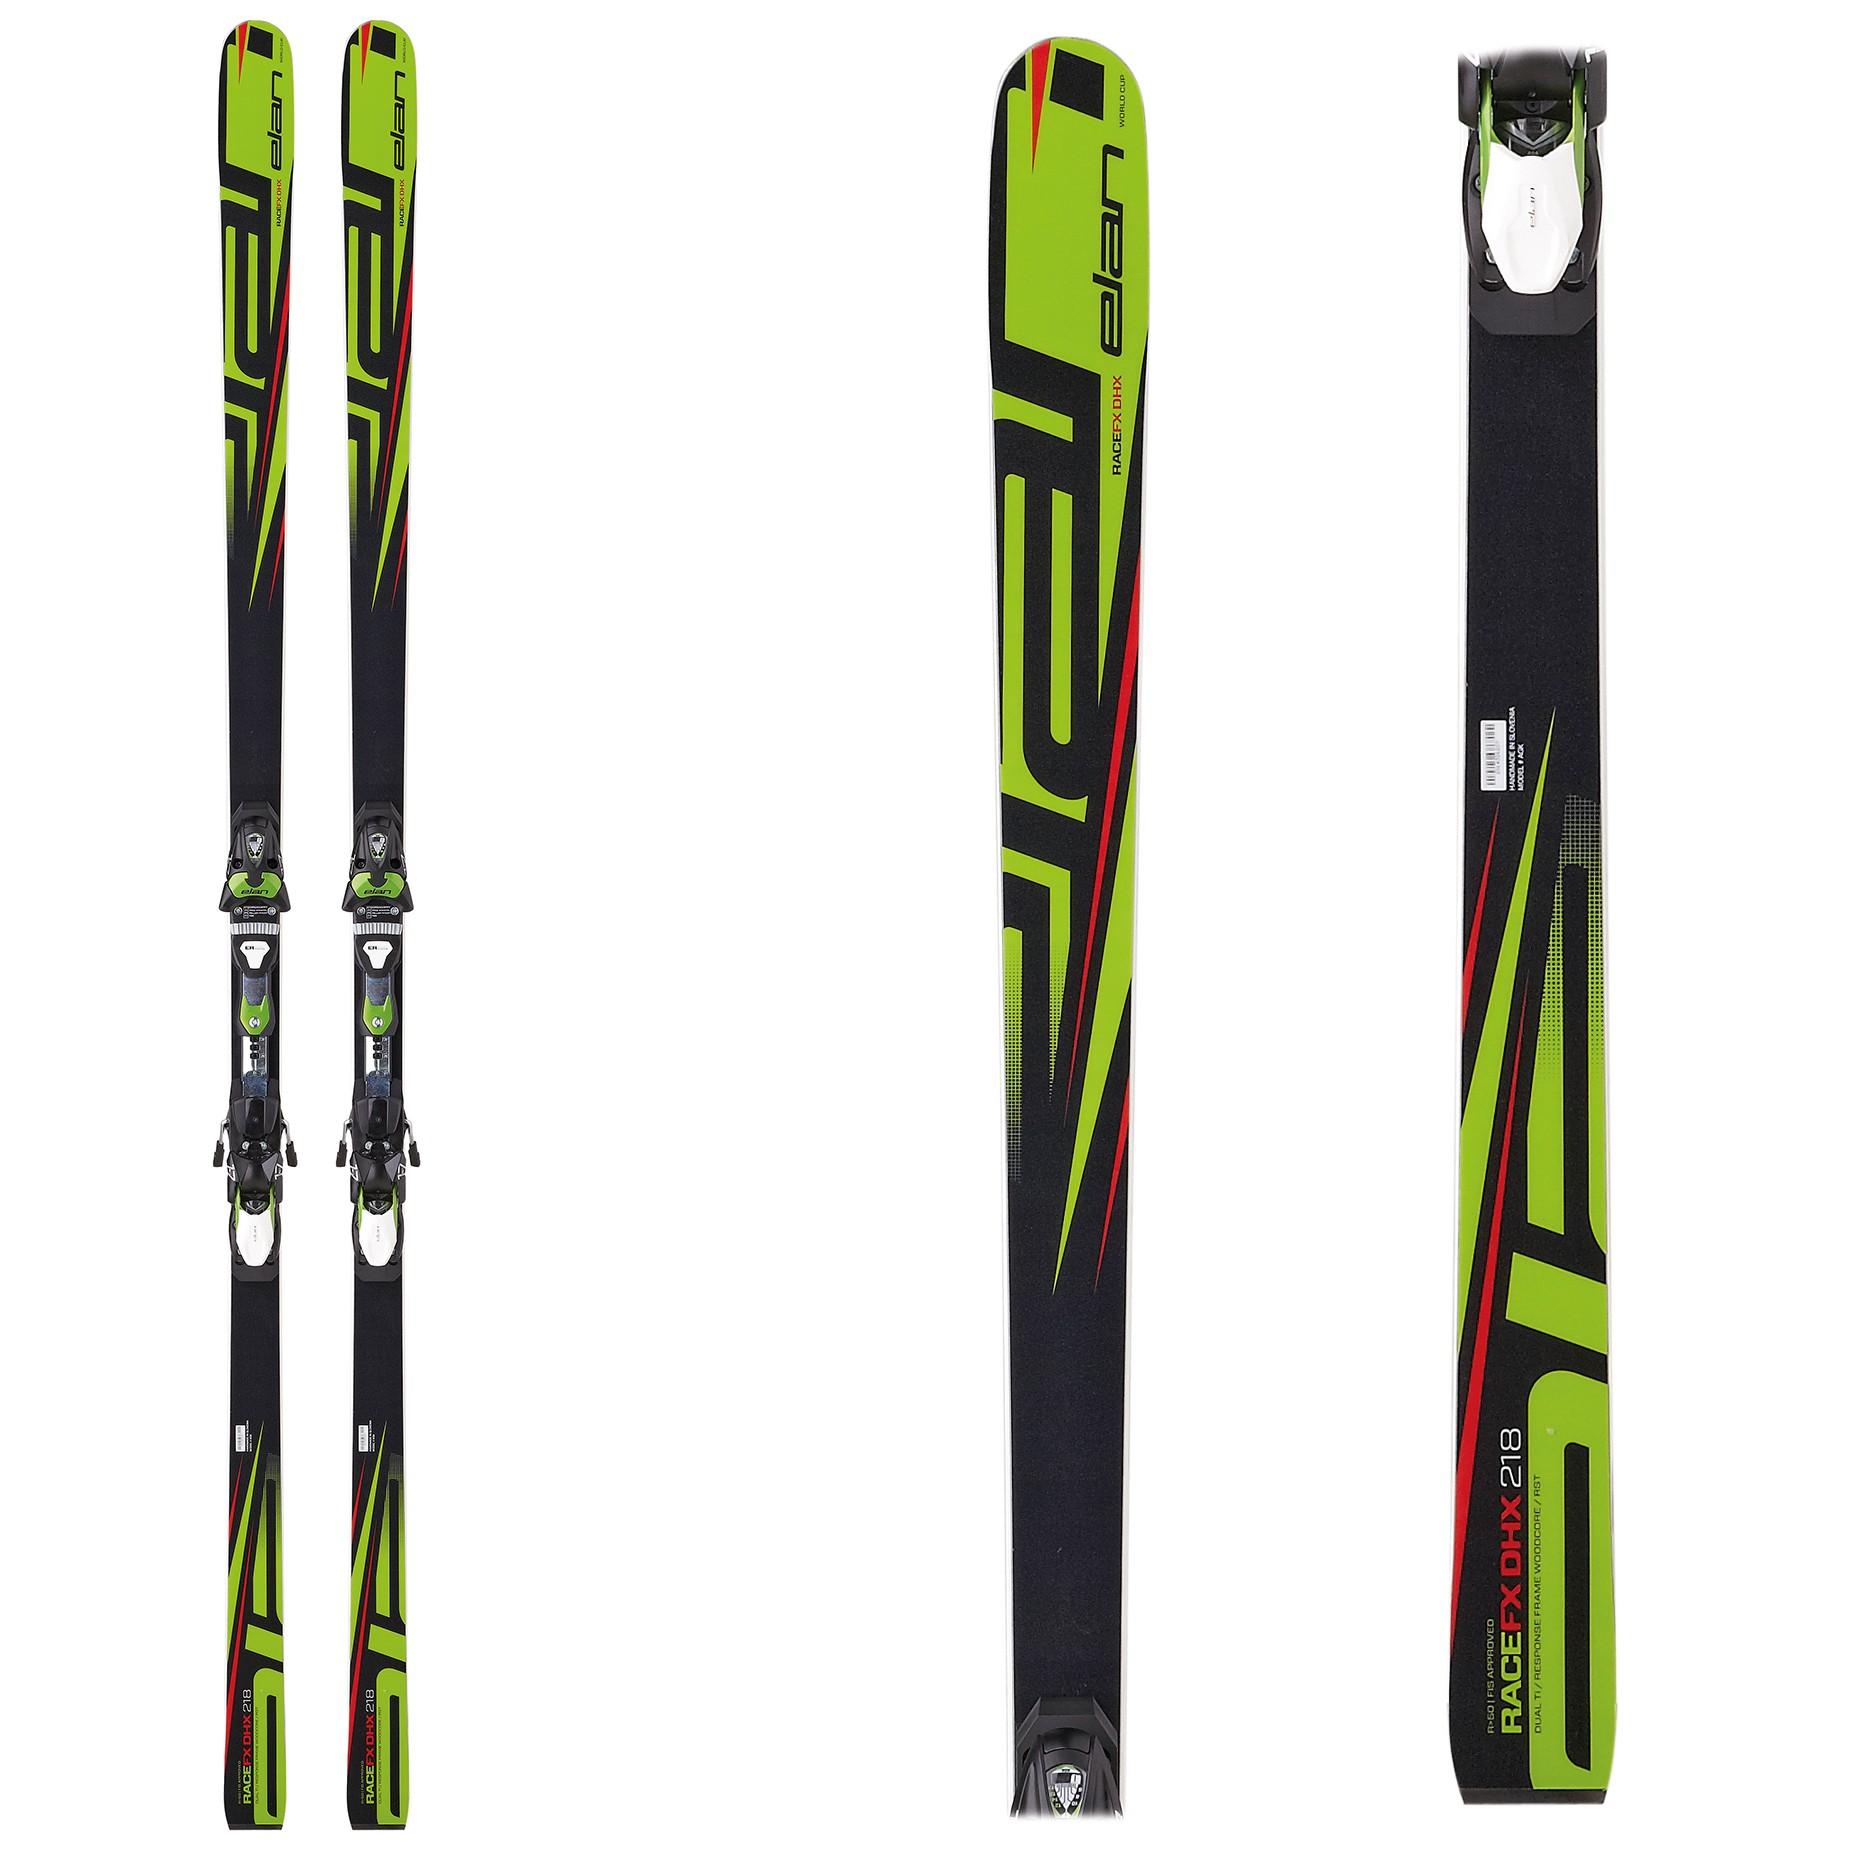 Elan FX DHX plate, FIS downhill skis, 2017